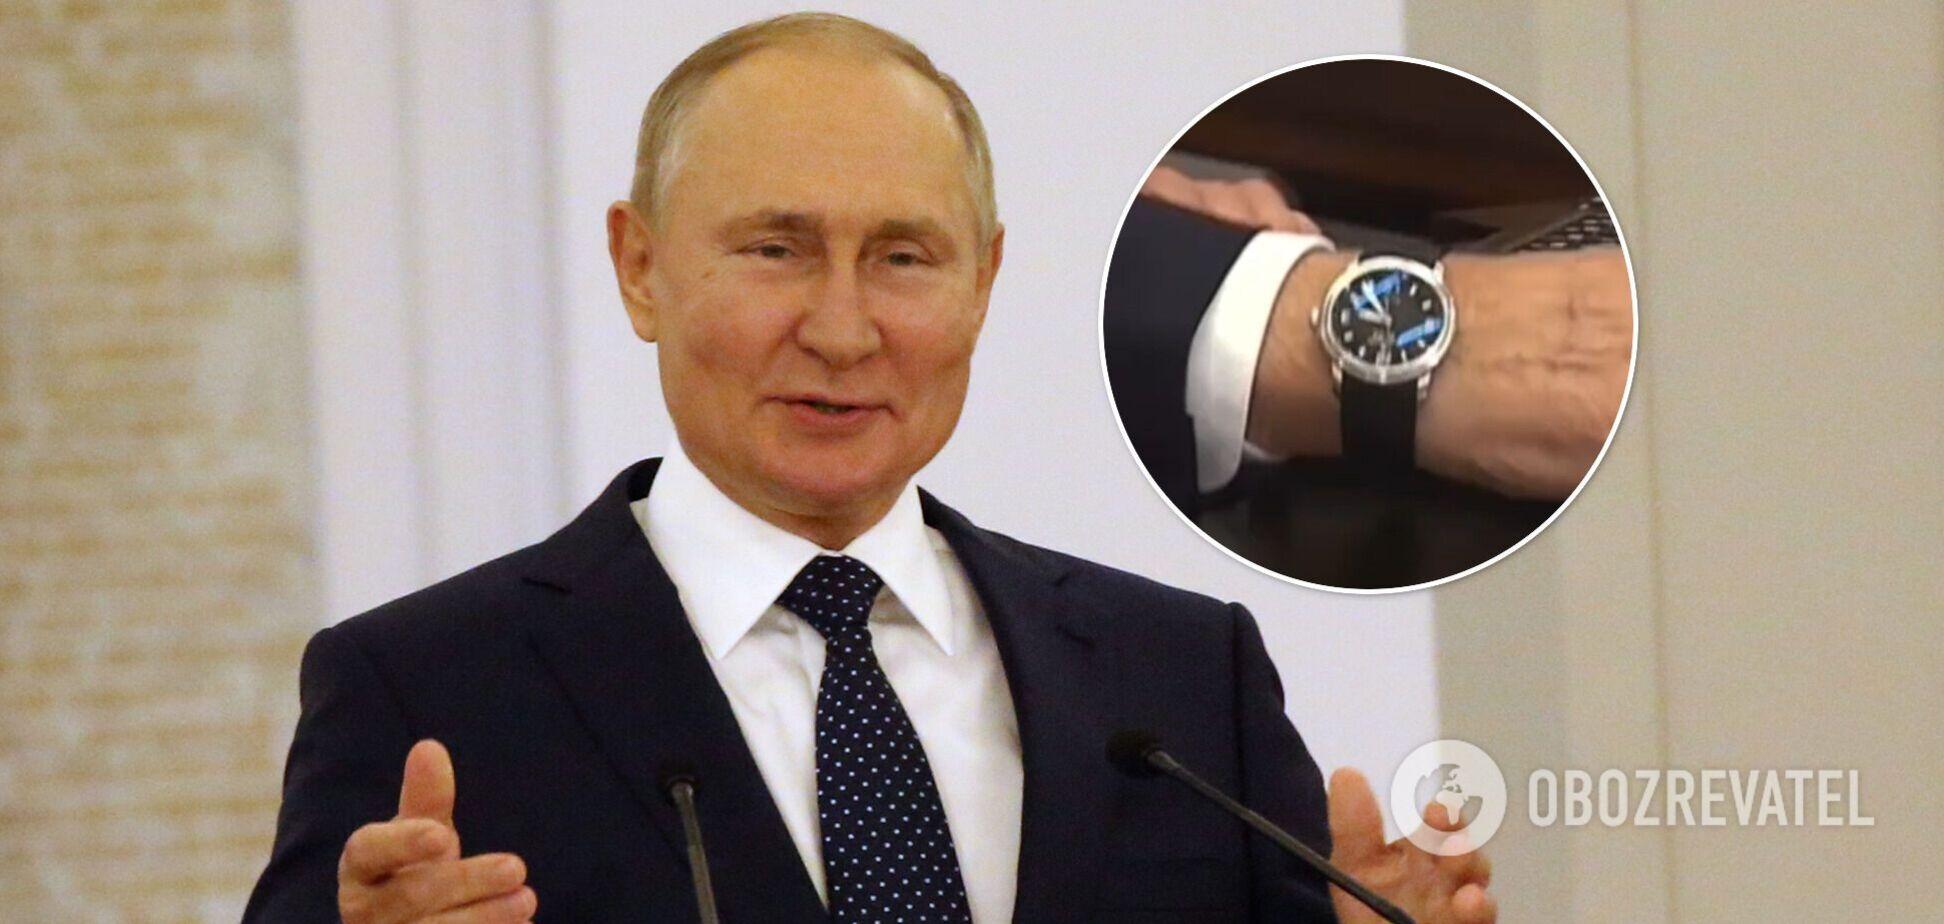 У Путина заметили странность на часах